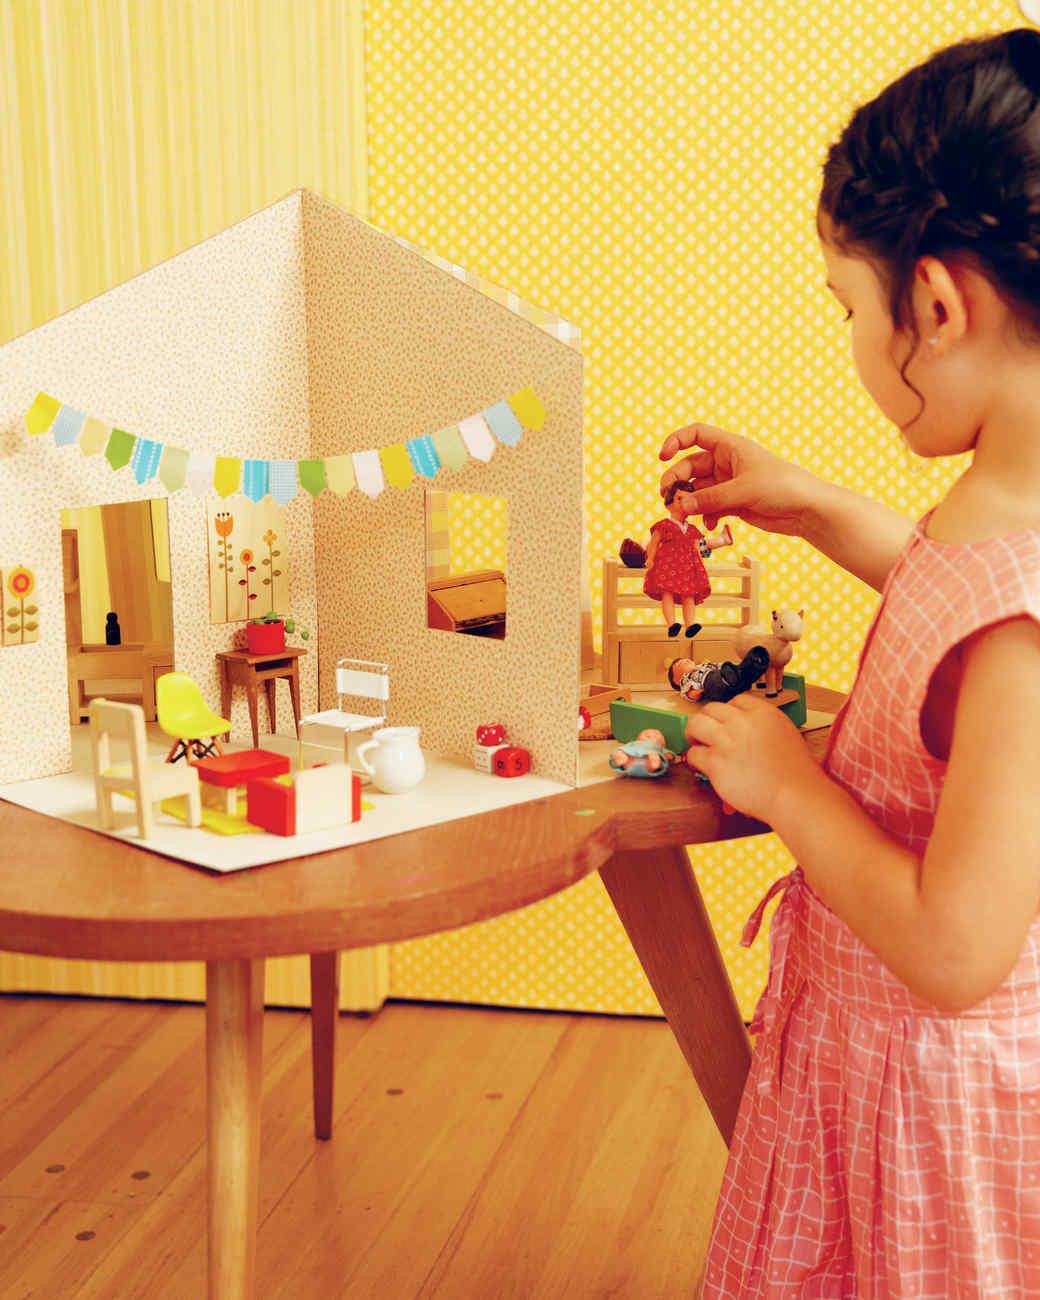 petit-collage-paper-dollhouse-3-0615.jpg